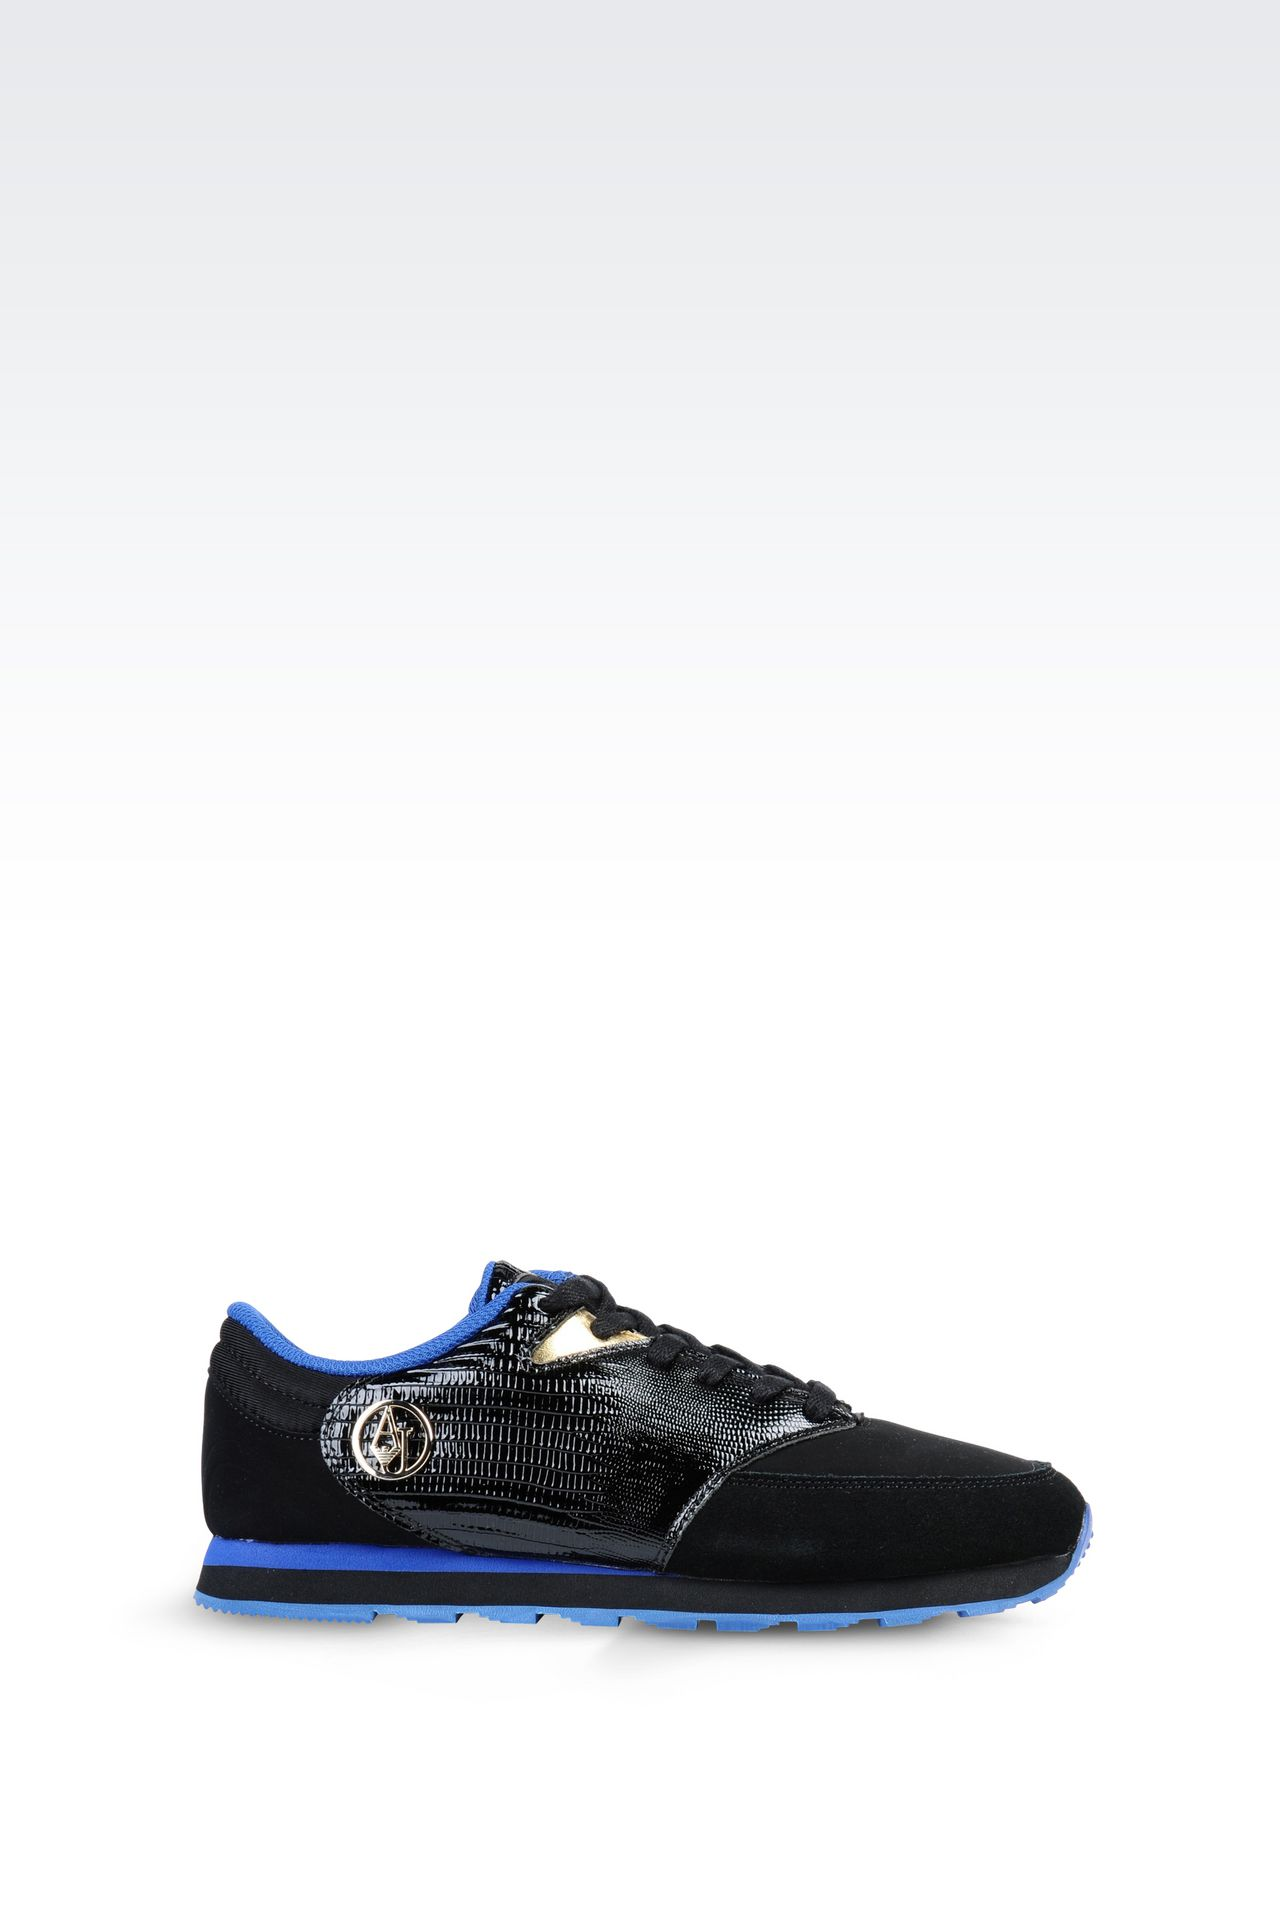 SNEAKER IN REPTILE PRINT LEATHER: Sneakers Women by Armani - 0